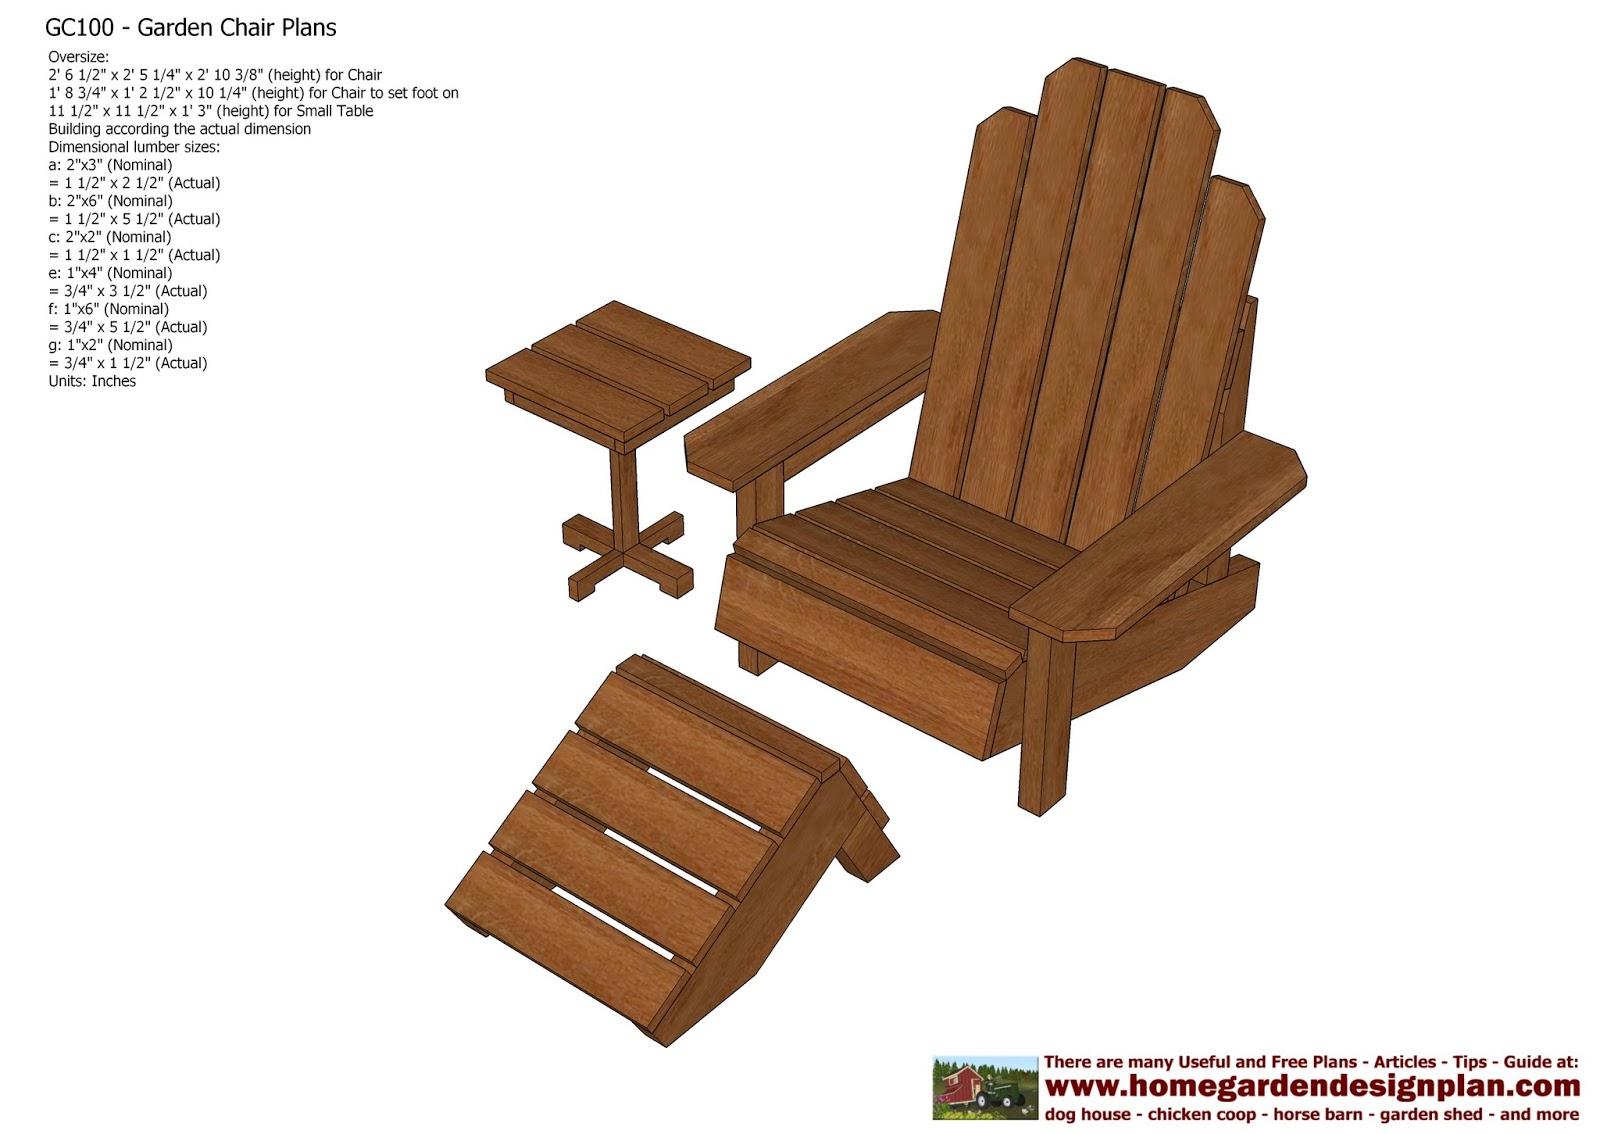 garden chair design plans rent kids chairs home gc101 out door